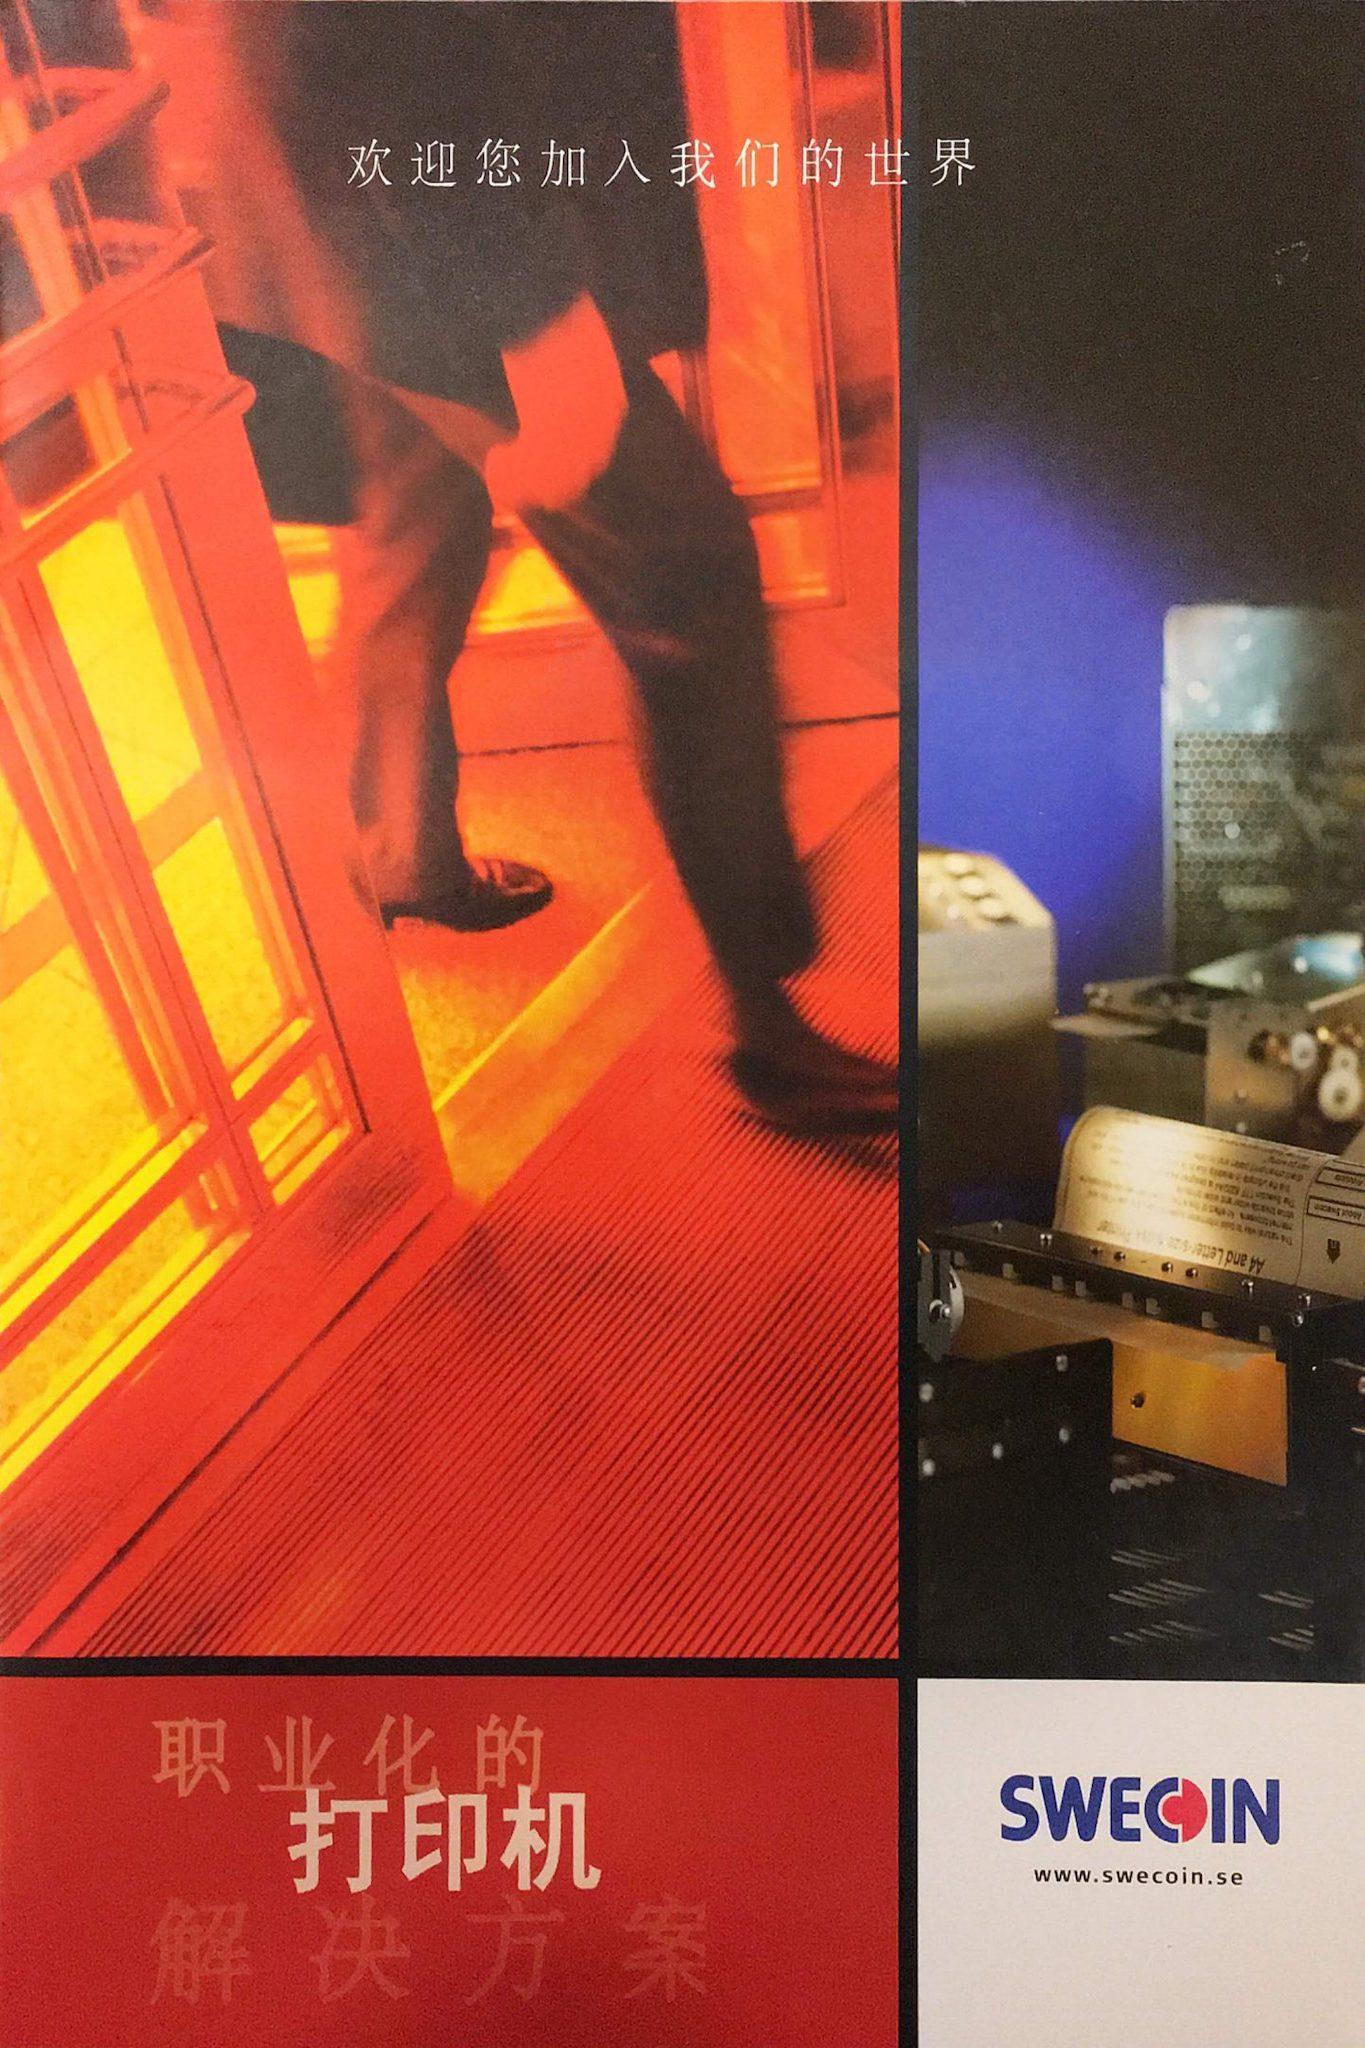 tekway-company-leaflets-brochures-swecoin-e1585129592705-1443x2048